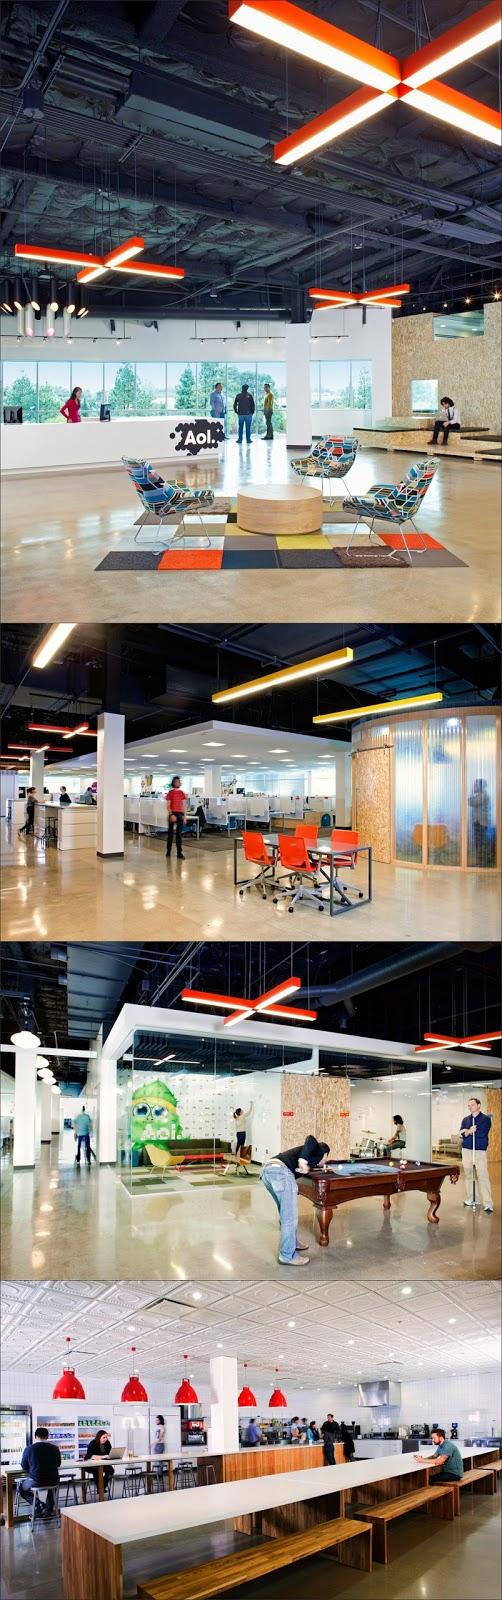 desain kantor modern Aol